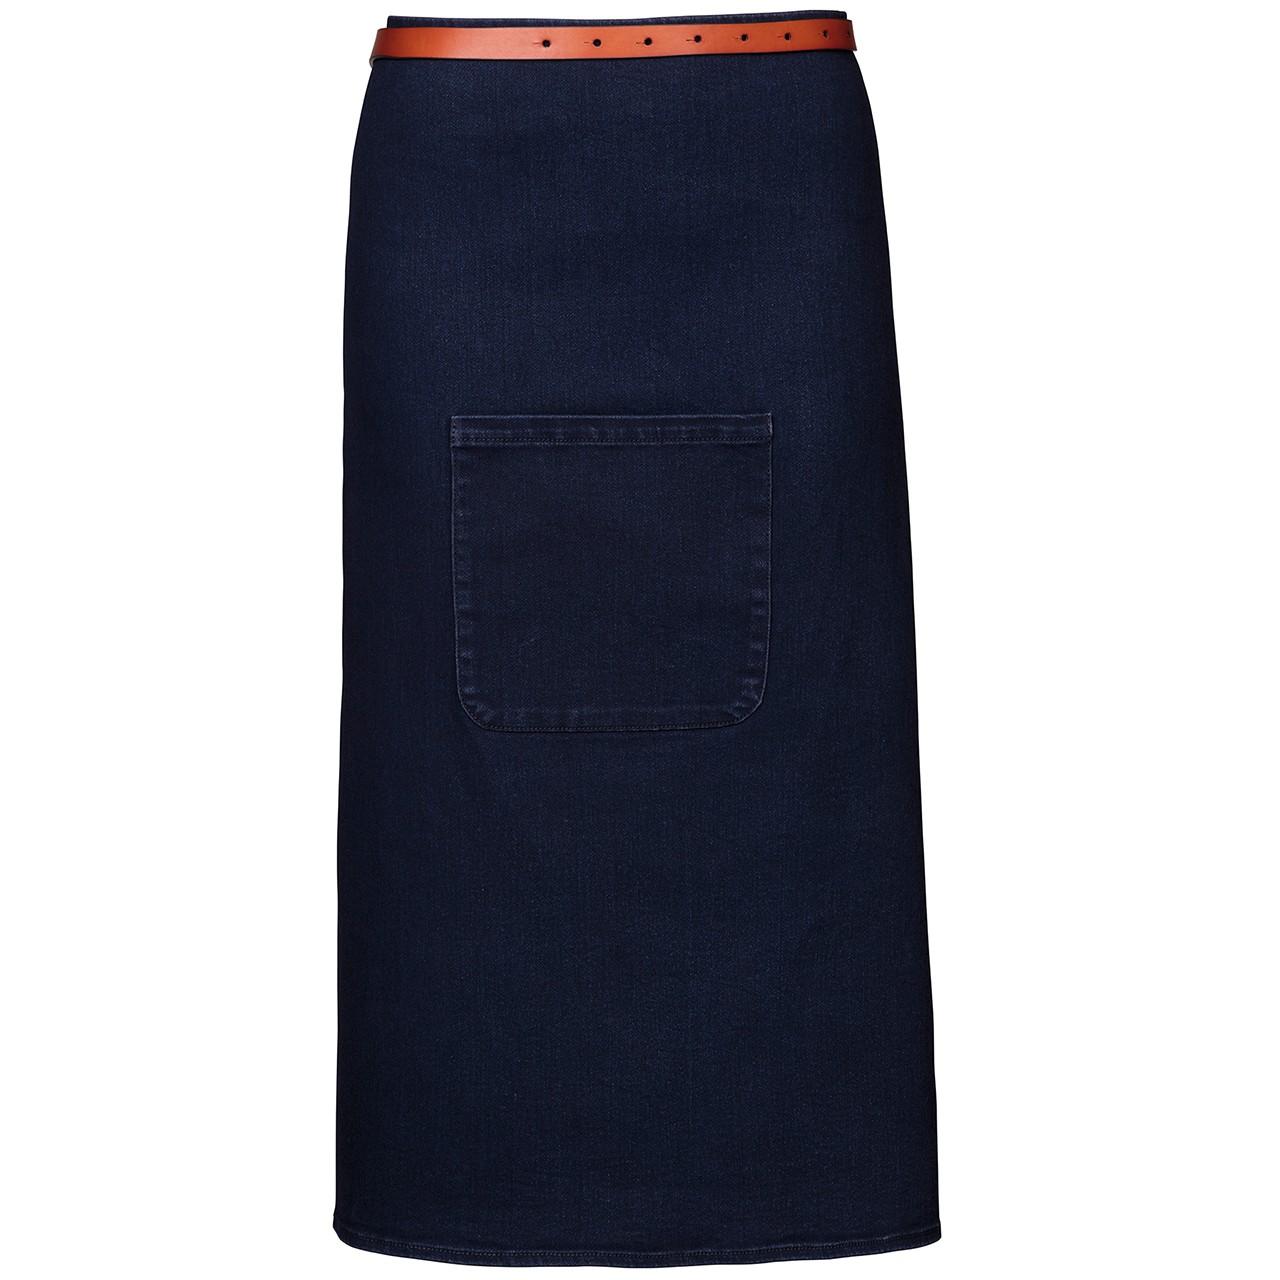 Kellnerschürze im Jeanslook (Stretch) Exner® | bedrucken, besticken, bedrucken lassen, besticken lassen, mit Logo |